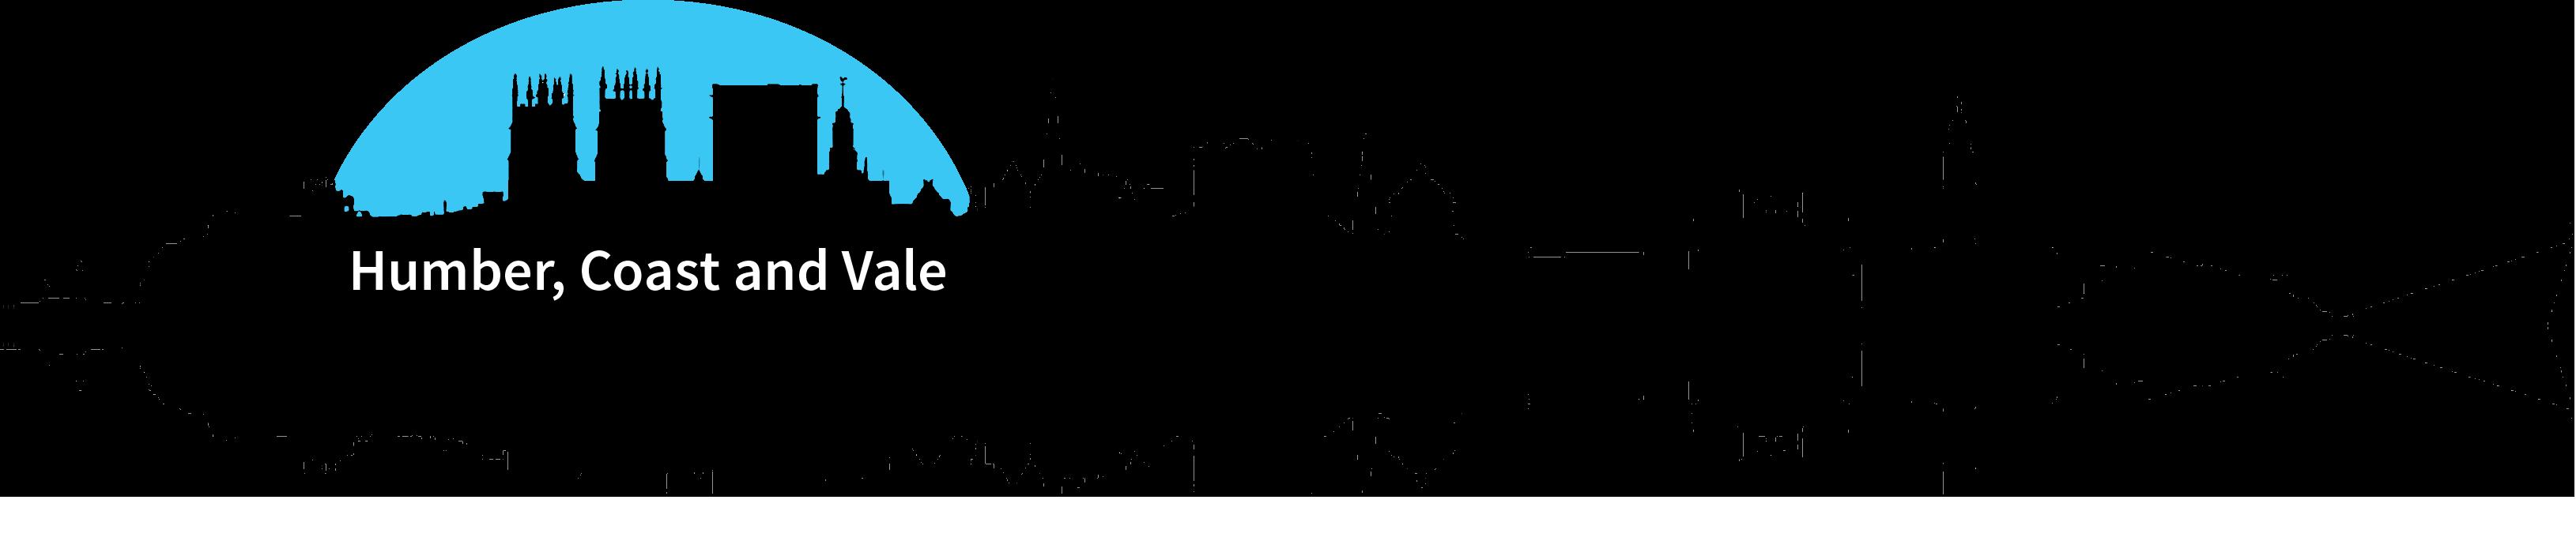 Humber, Coast and Vale logo